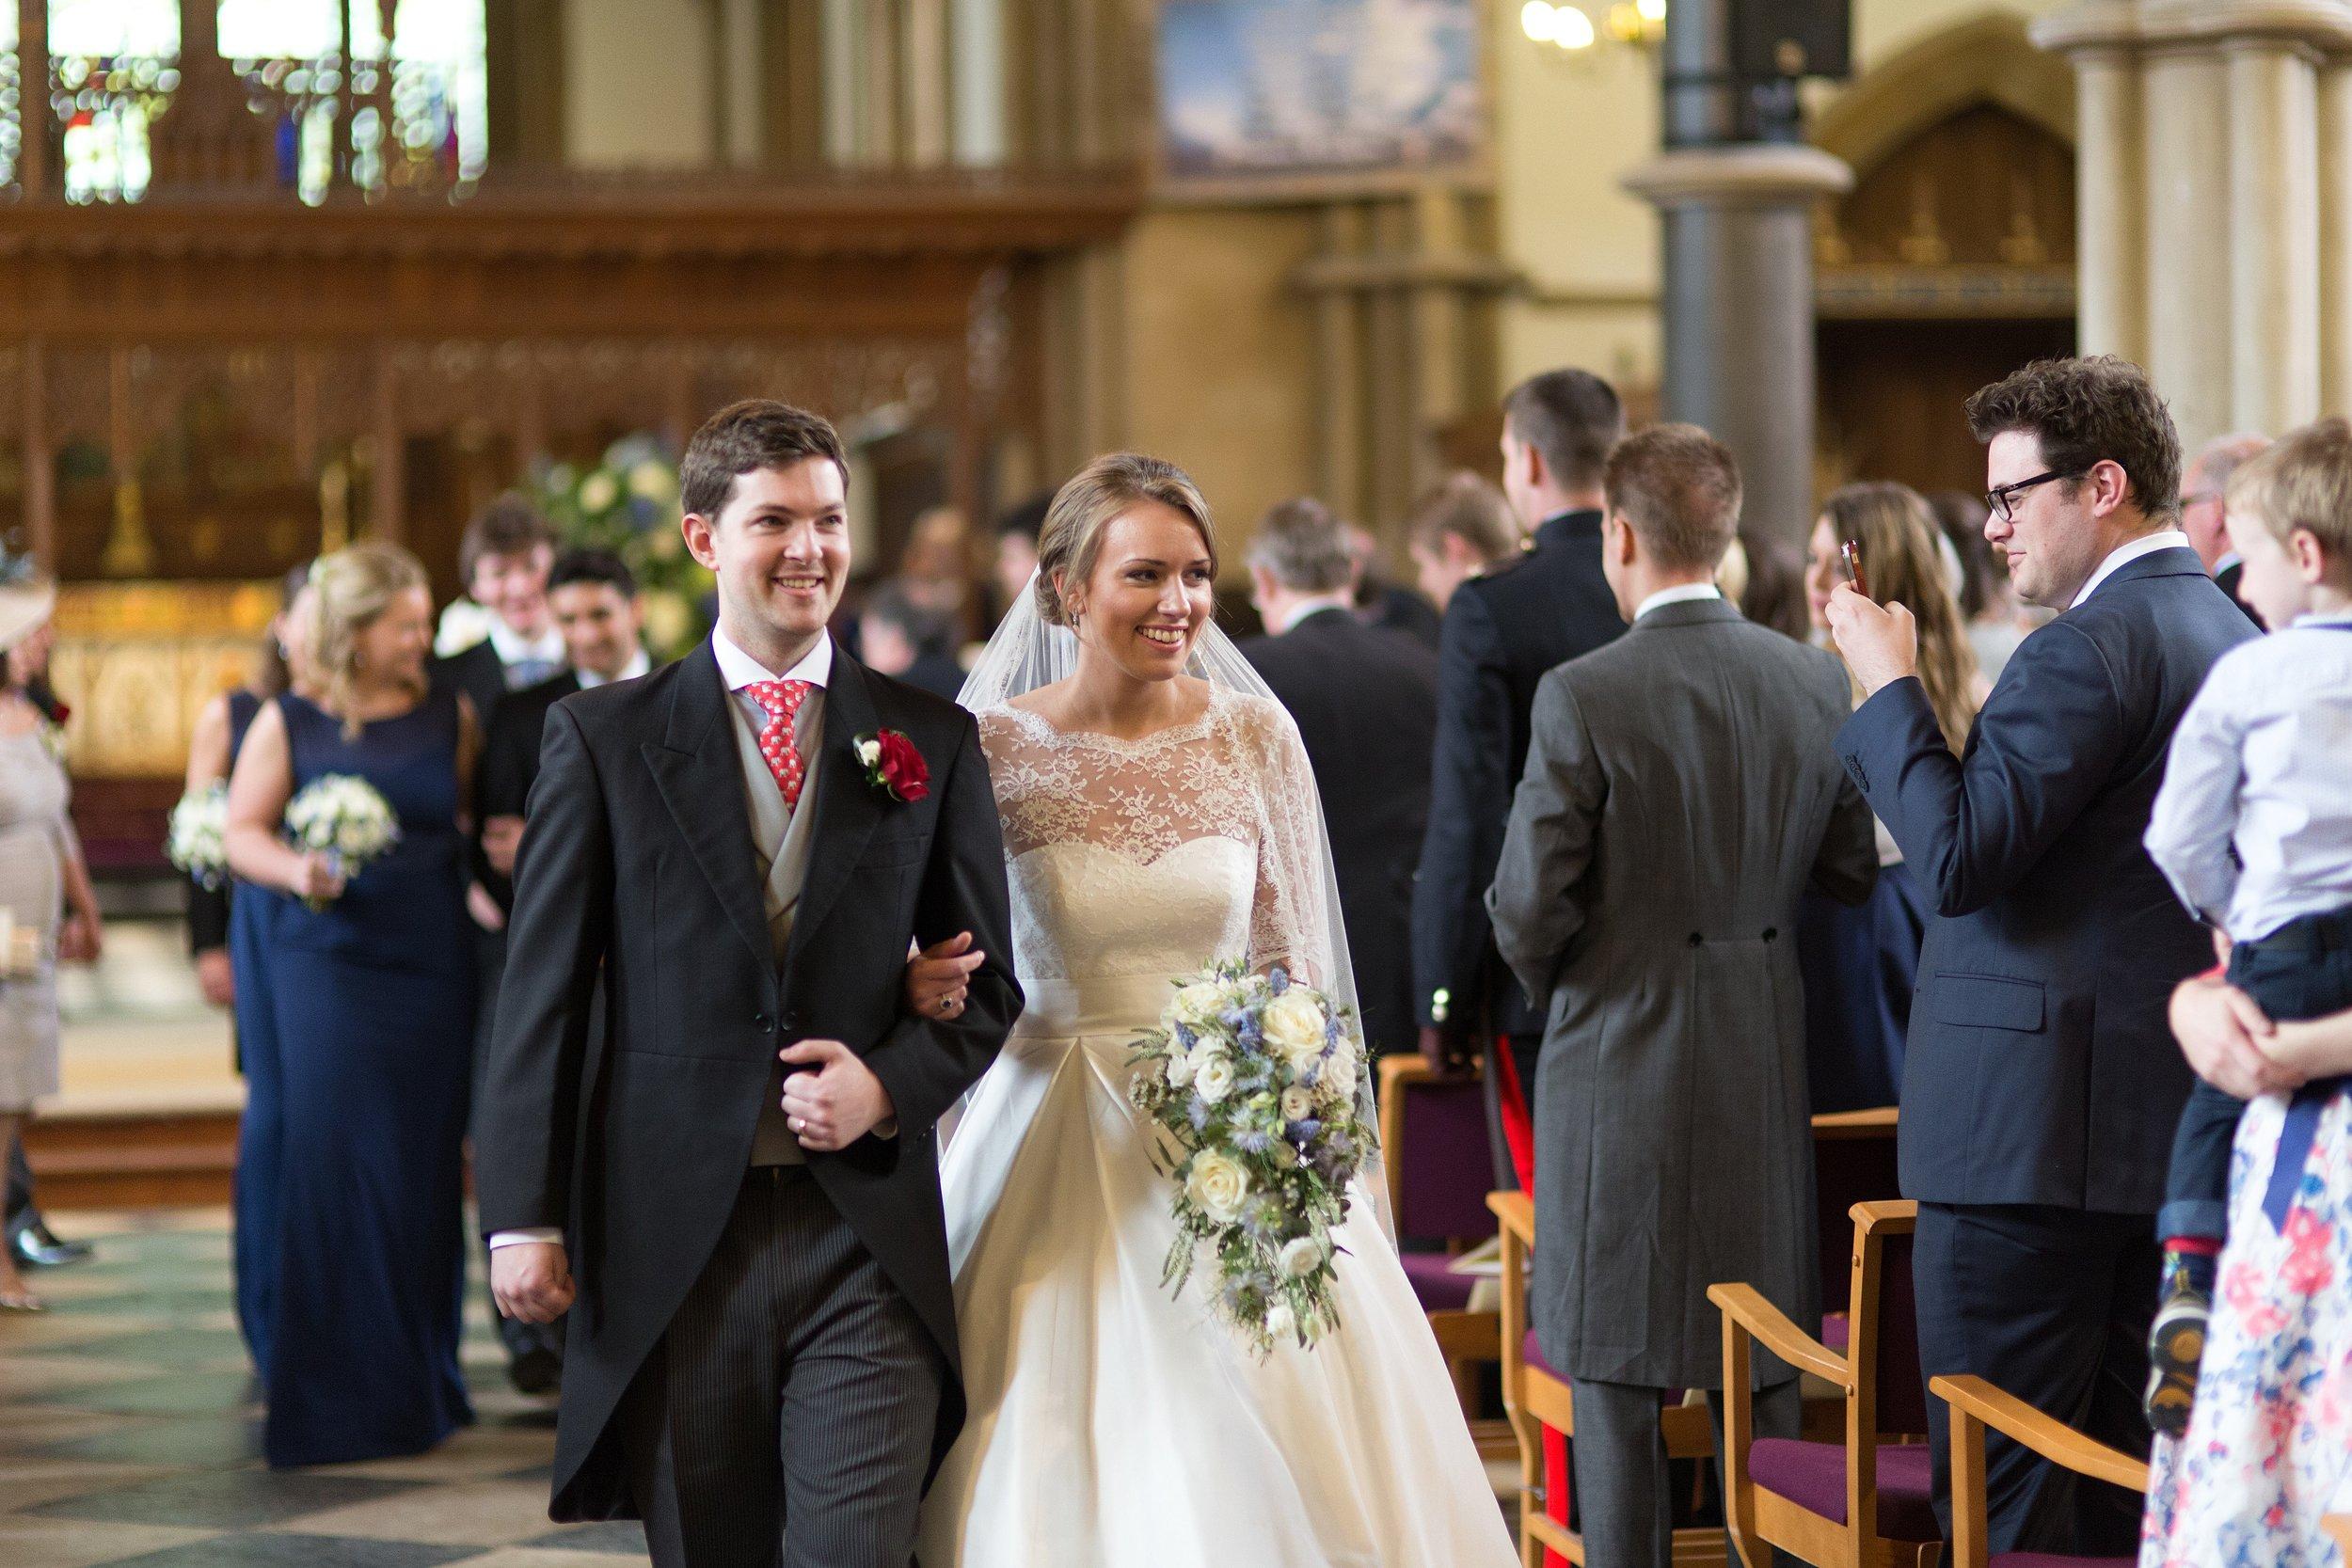 BRIDE_BOUQUET_CASCADE_MIRIAM_FAITH_WEDDING_FLOWERS.jpg